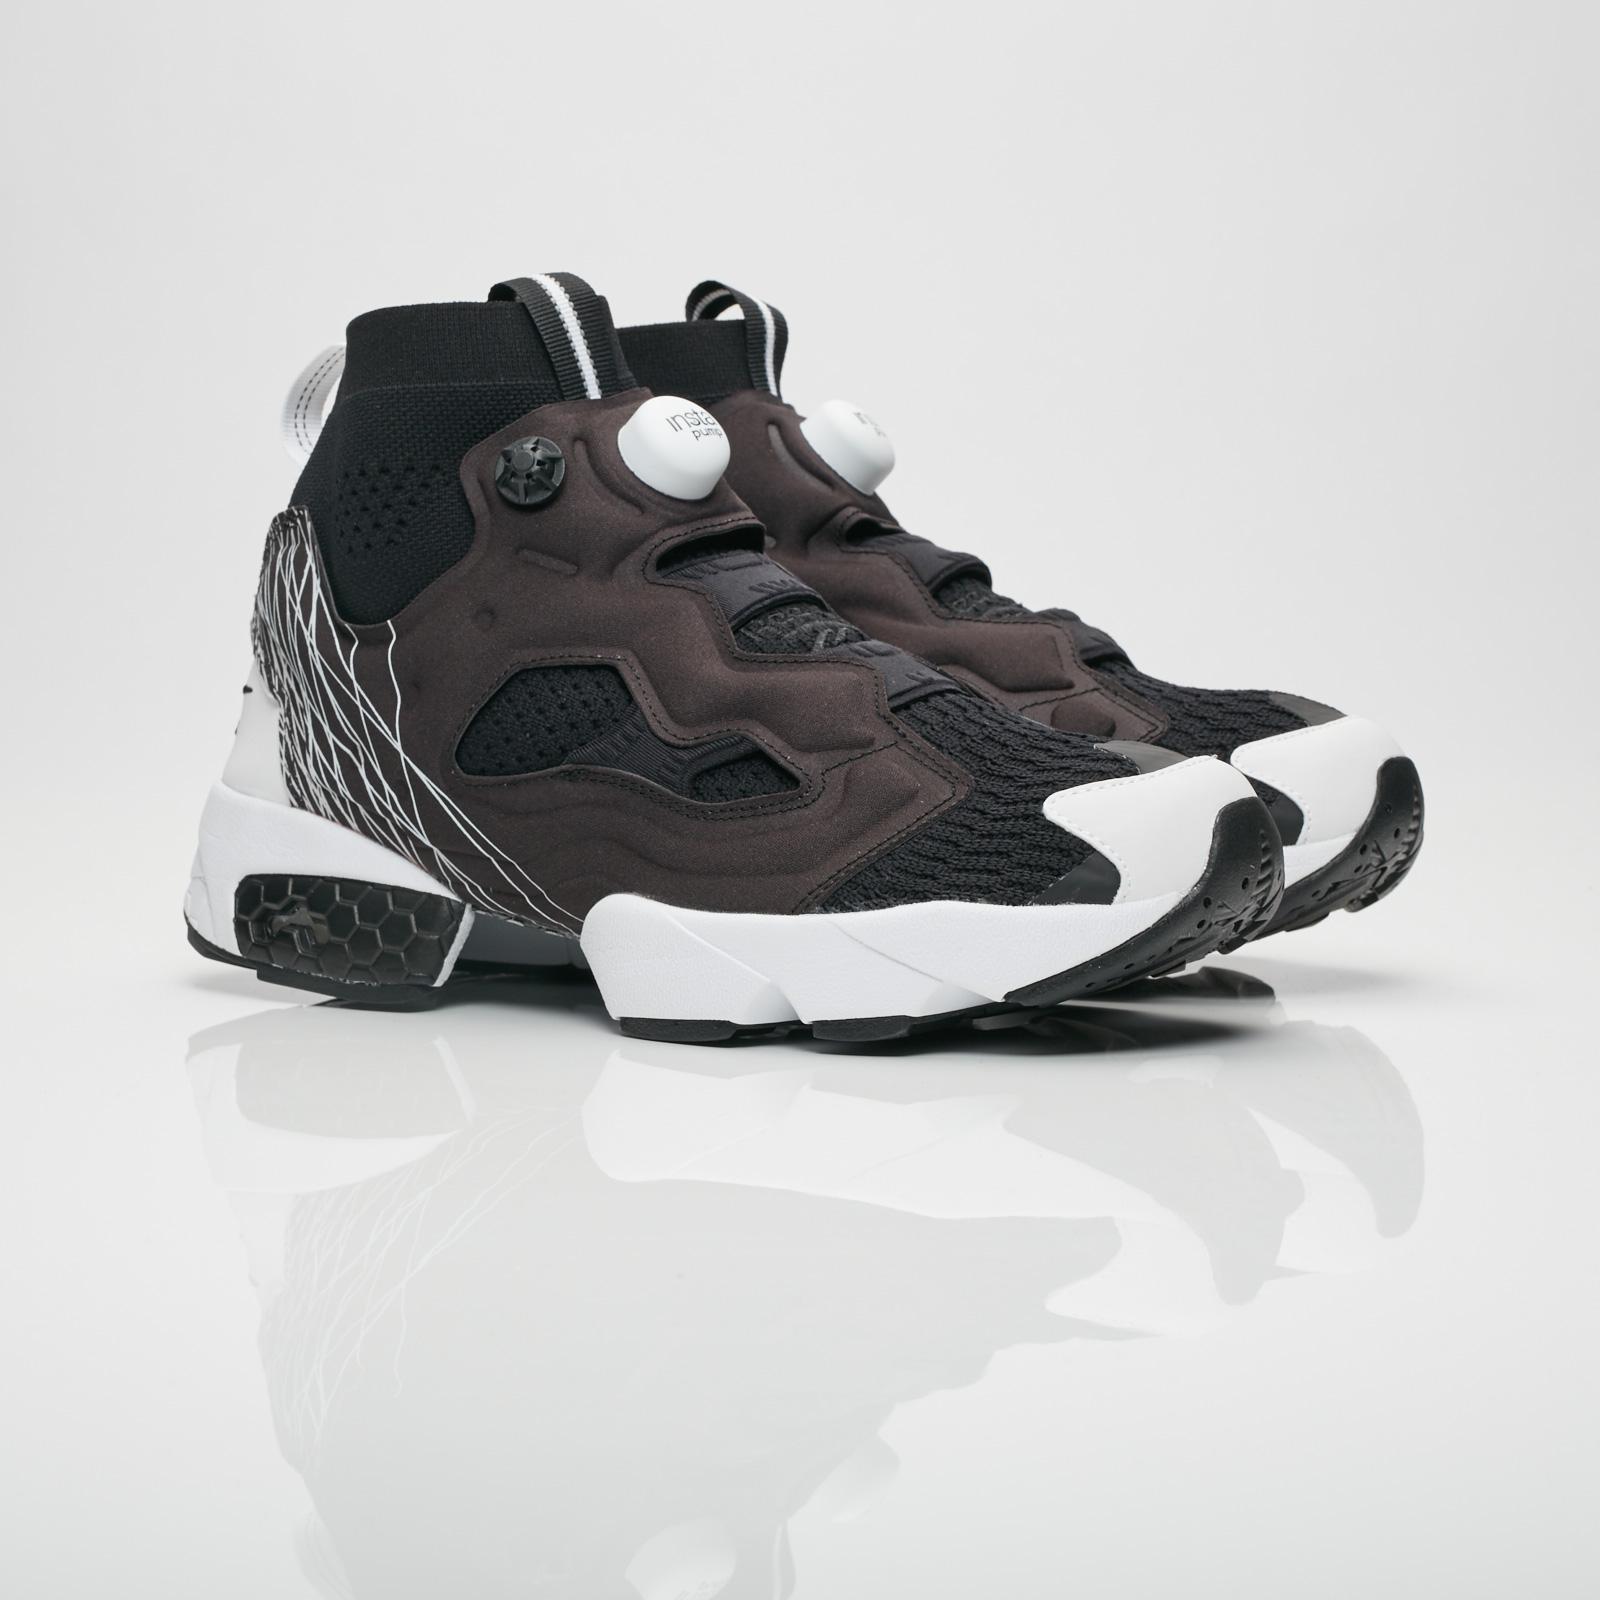 2776a56e12b Reebok Instapump Fury OG - Bs8159 - Sneakersnstuff